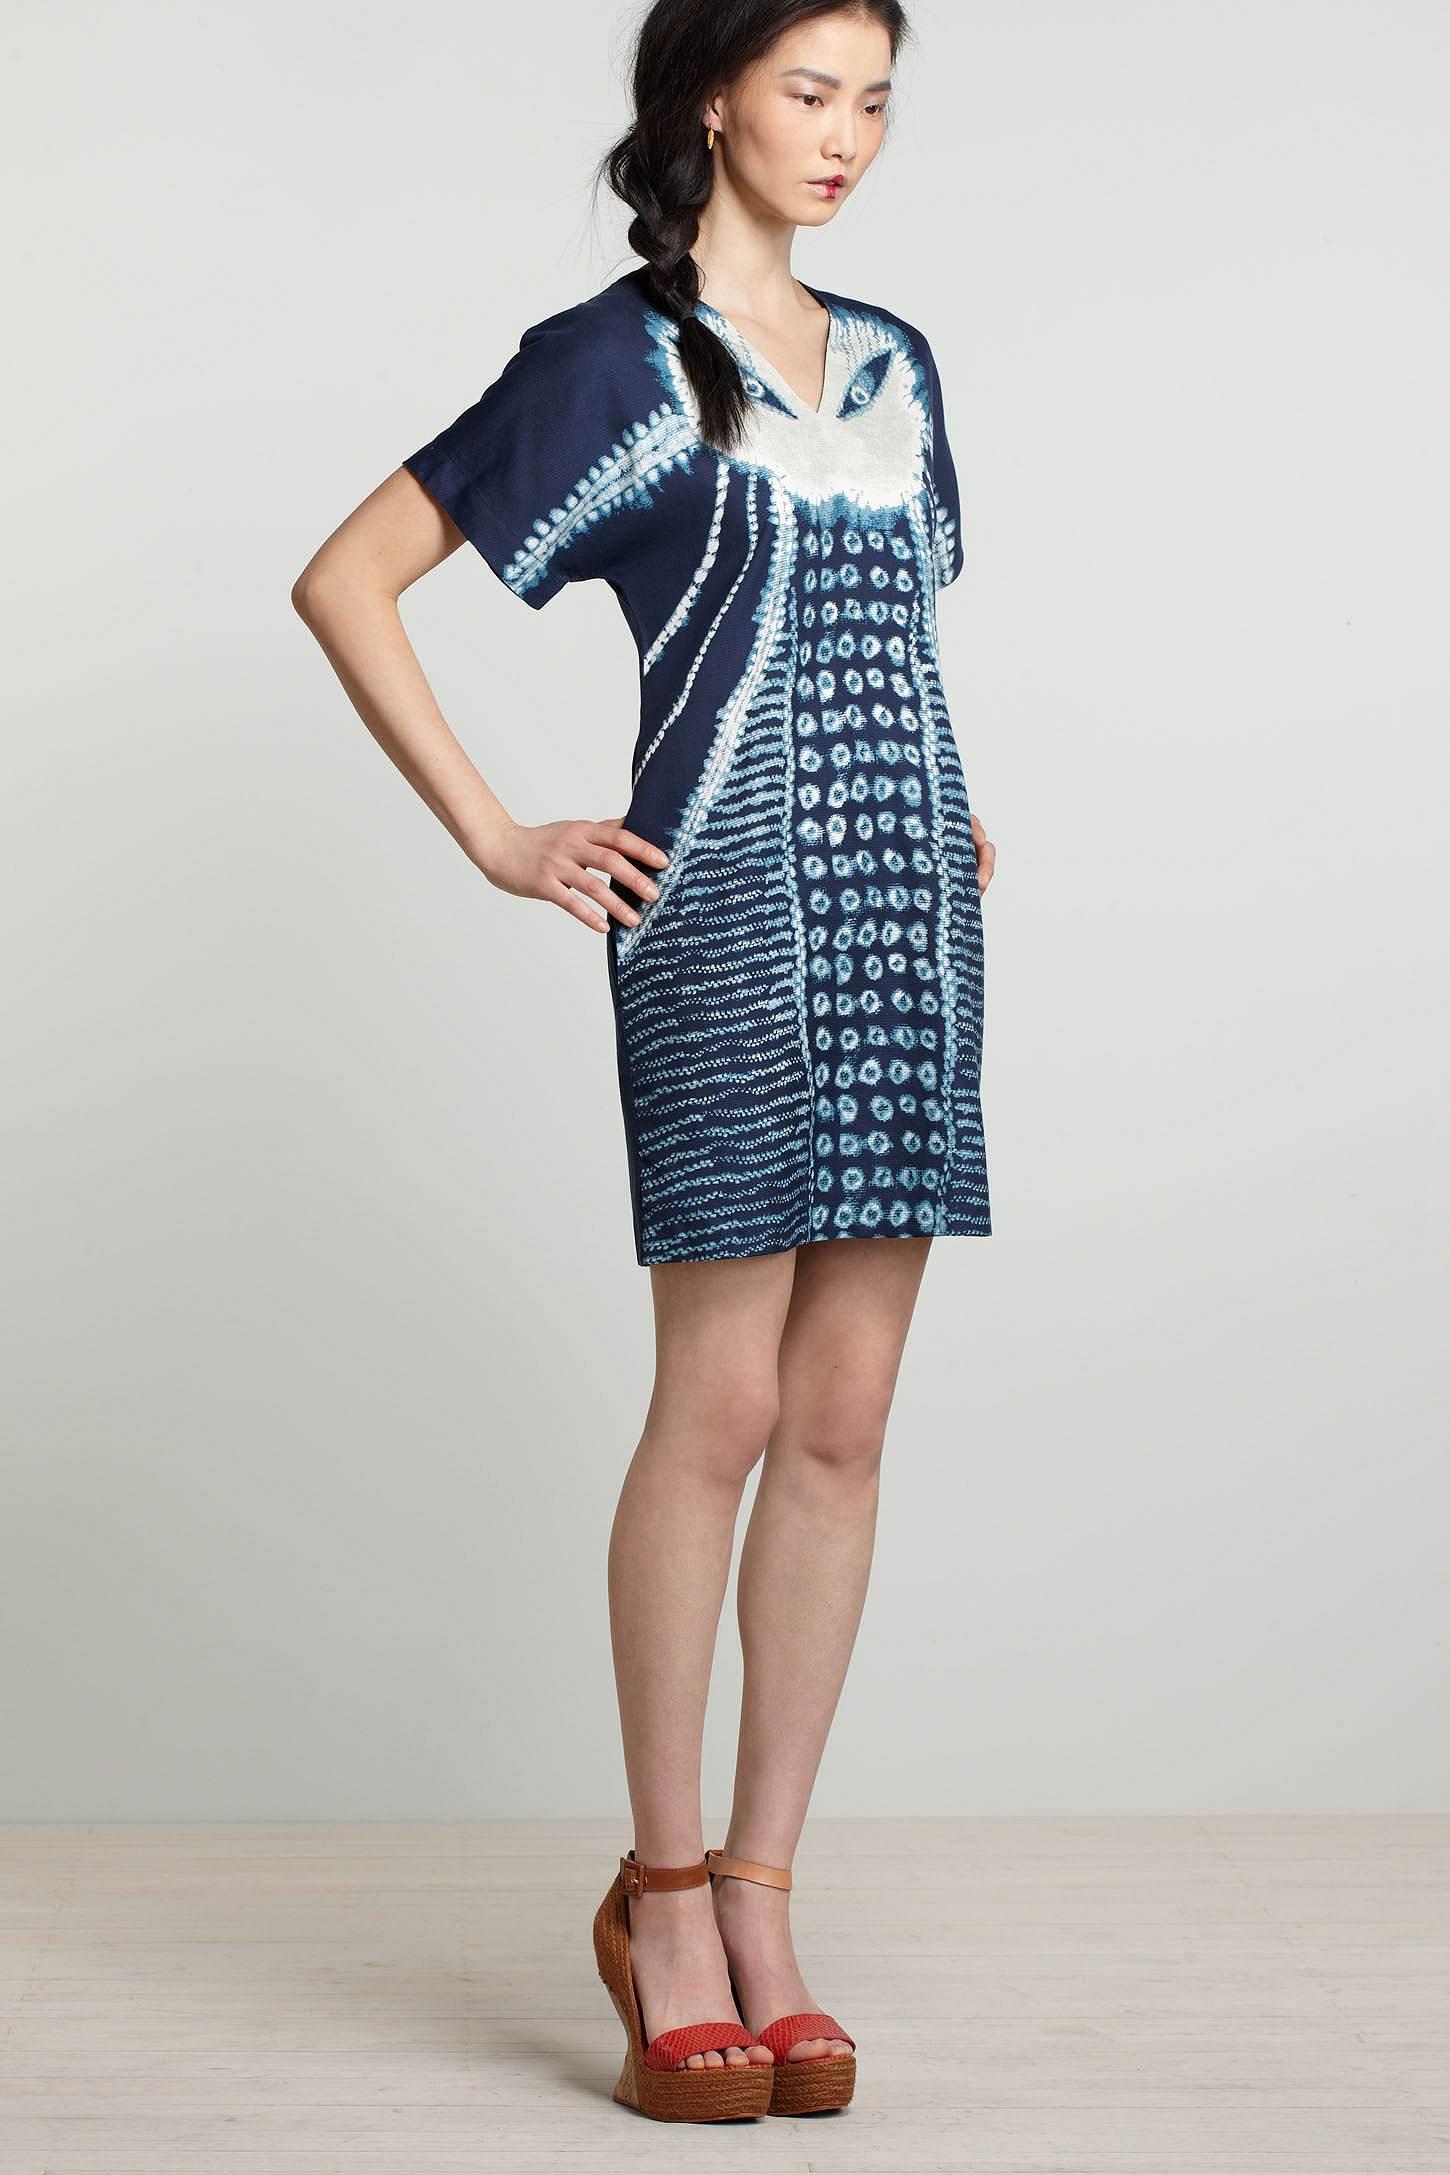 Falconry Dress by Charlotte Linton